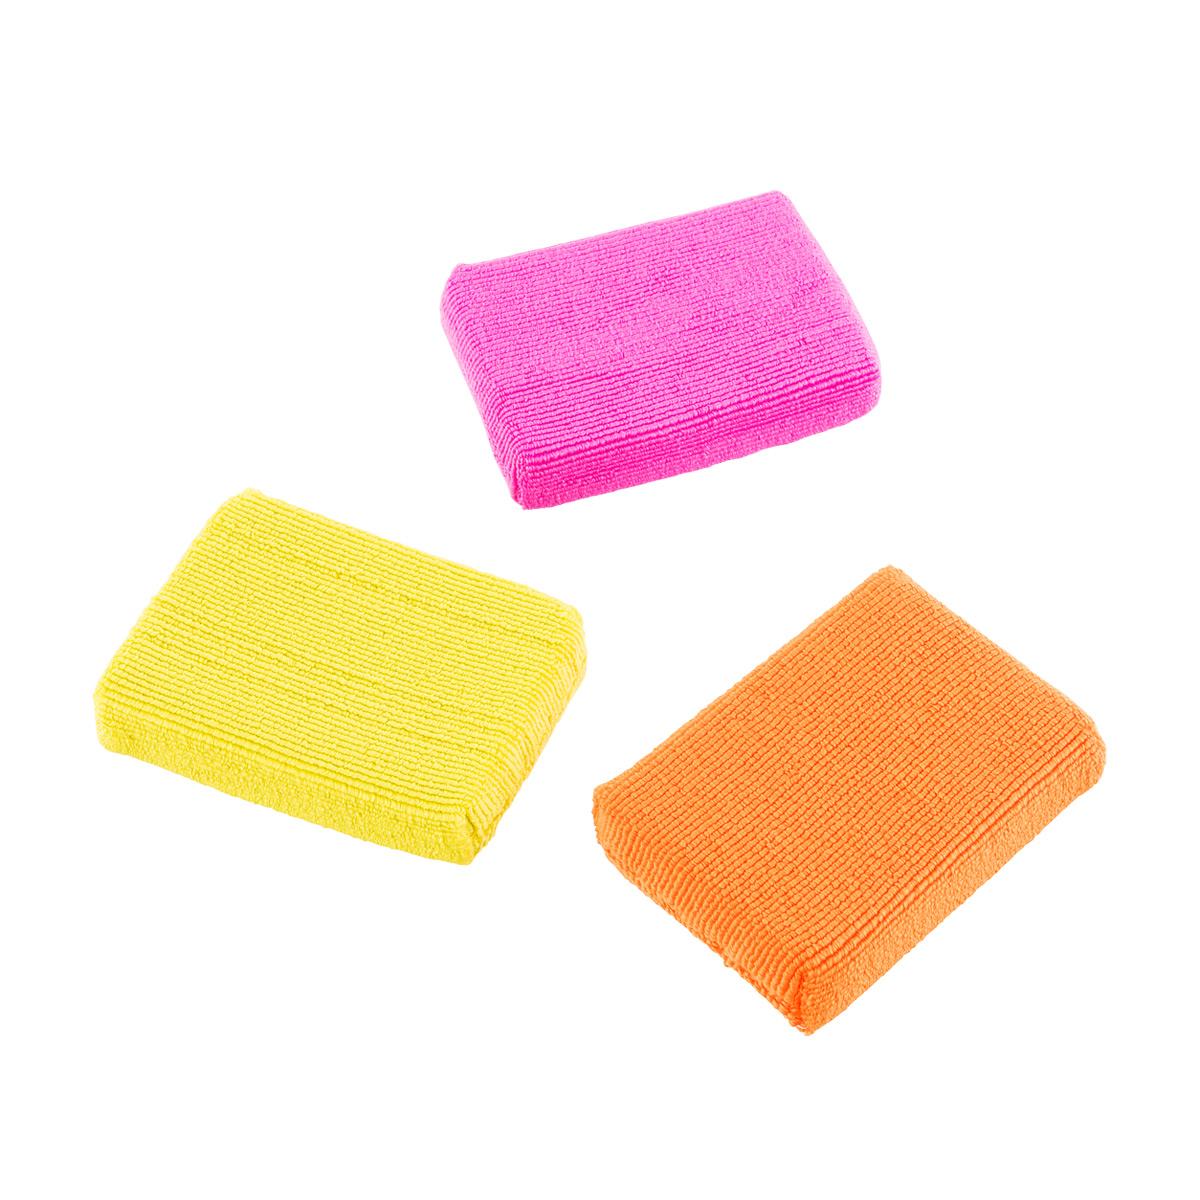 Casabella Microfiber Sponges